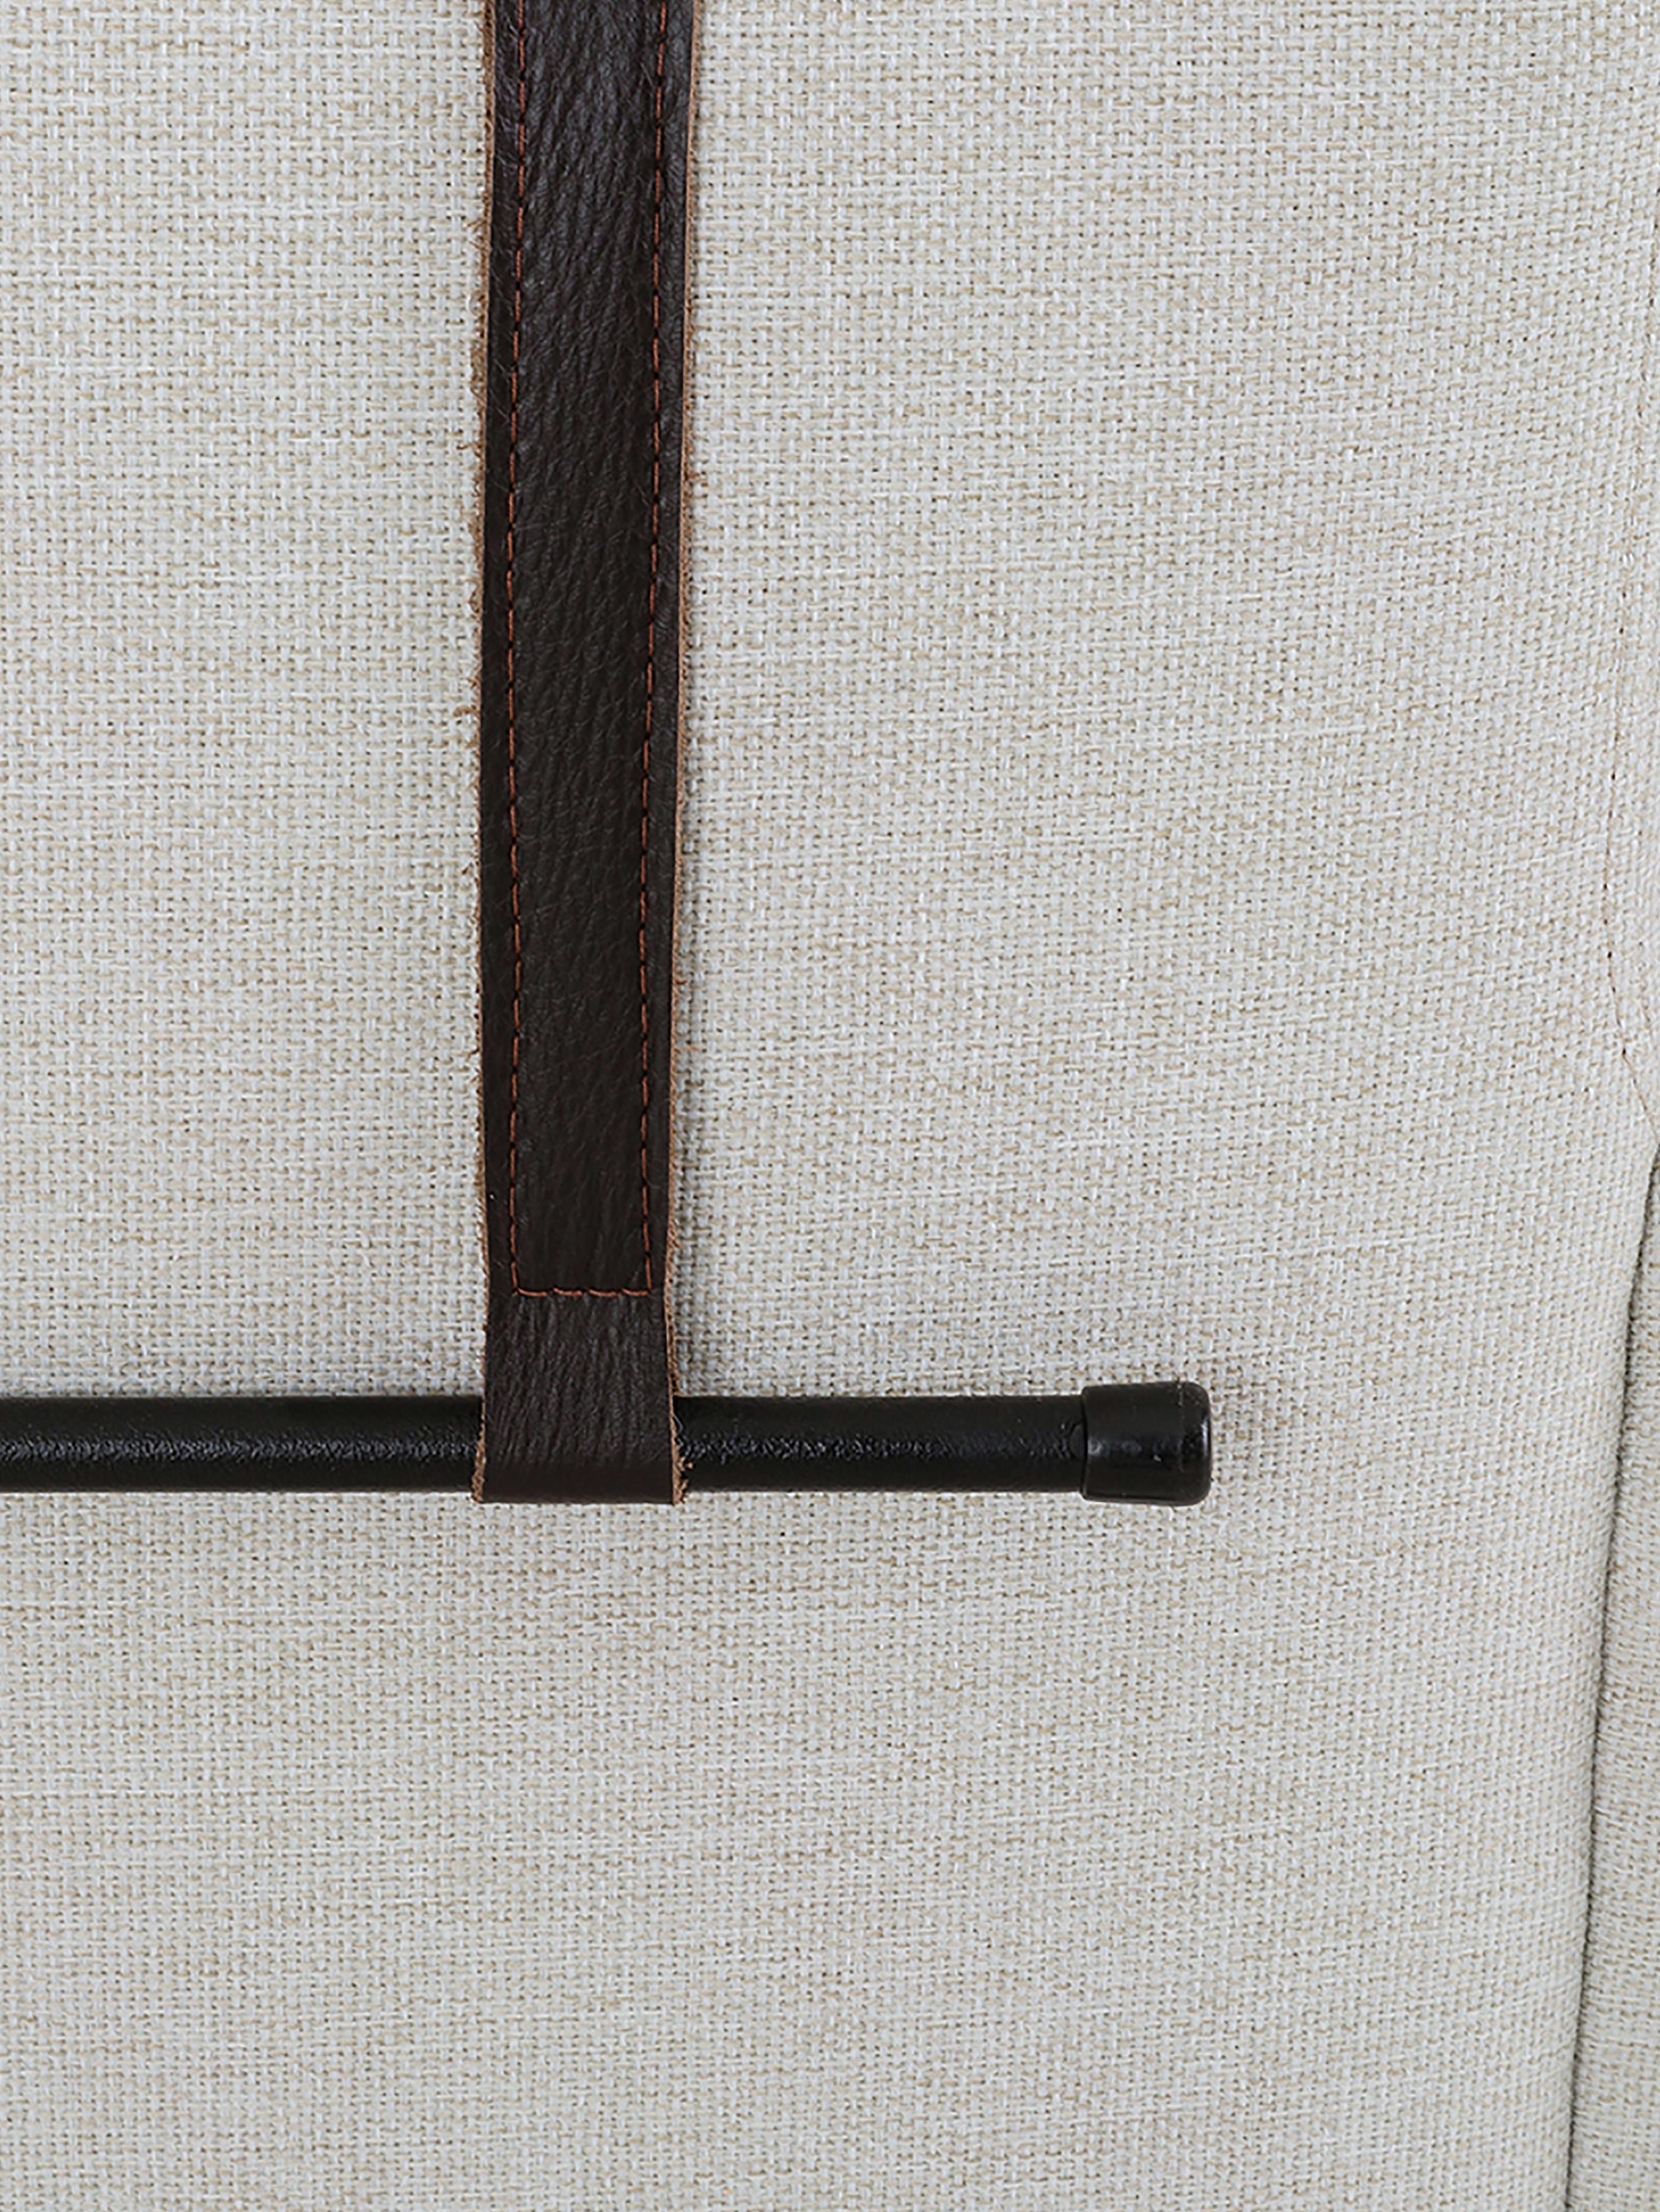 Ecksofa Brooks, Bezug: Polyester 35.000 Scheuert, Gestell: Kiefernholz, massiv, Rahmen: Kiefernholz, lackiert, Füße: Metall, pulverbeschichtet, Webstoff Beige, B 315 x T 148 cm